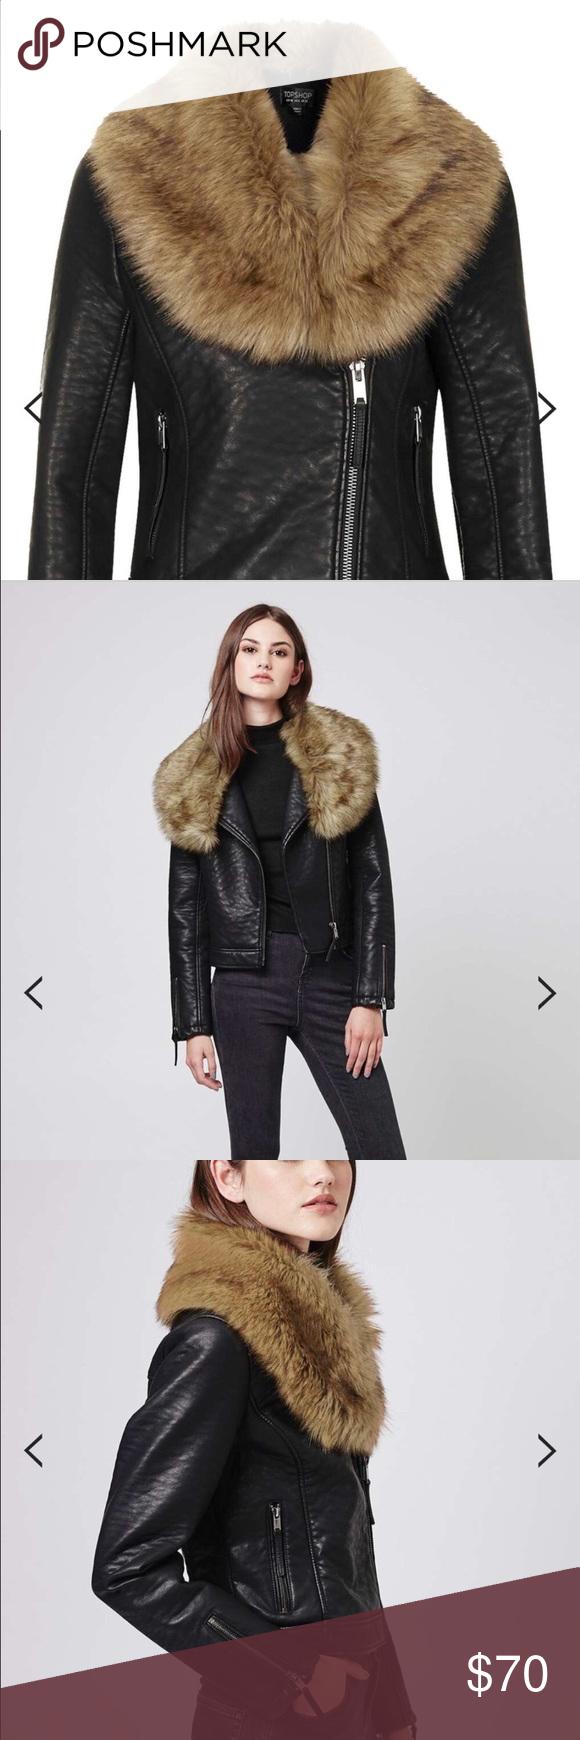 Faux Fur Faux Leather Moto Jacket Size 2 Inside